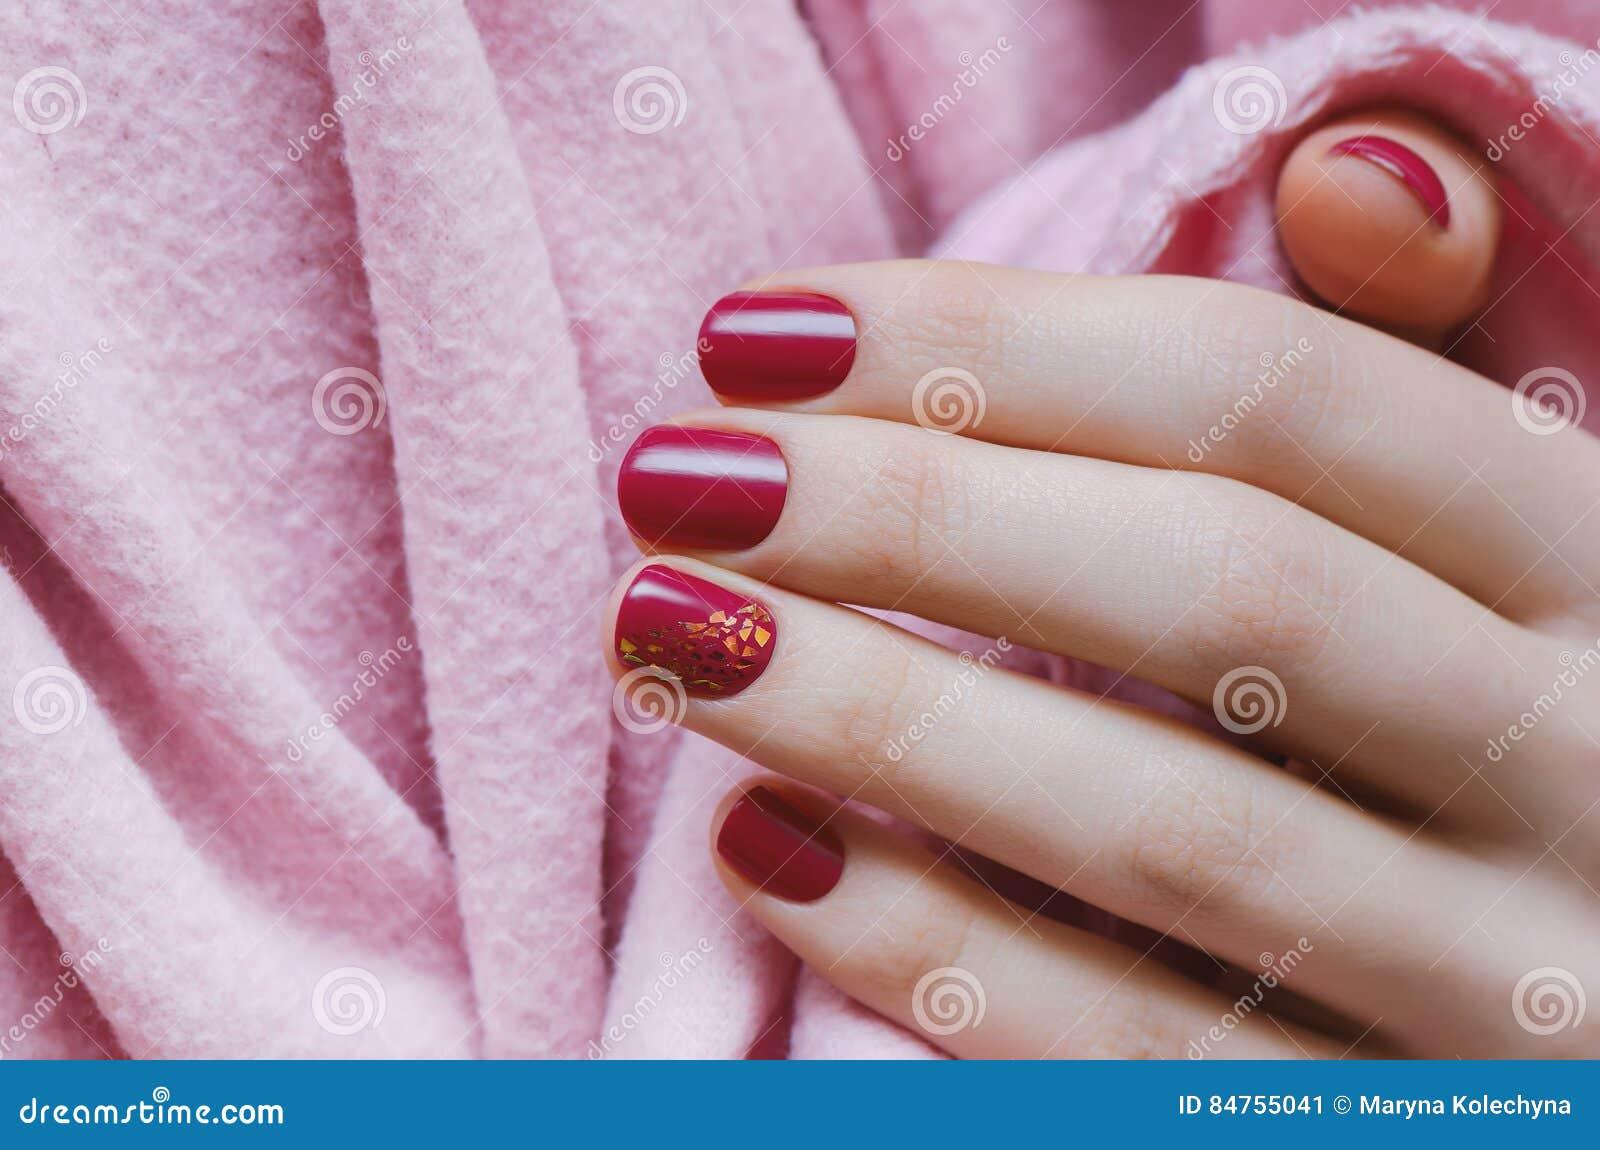 Beautiful Female Hand With Dark Pink Nail Design. Stock Image ...